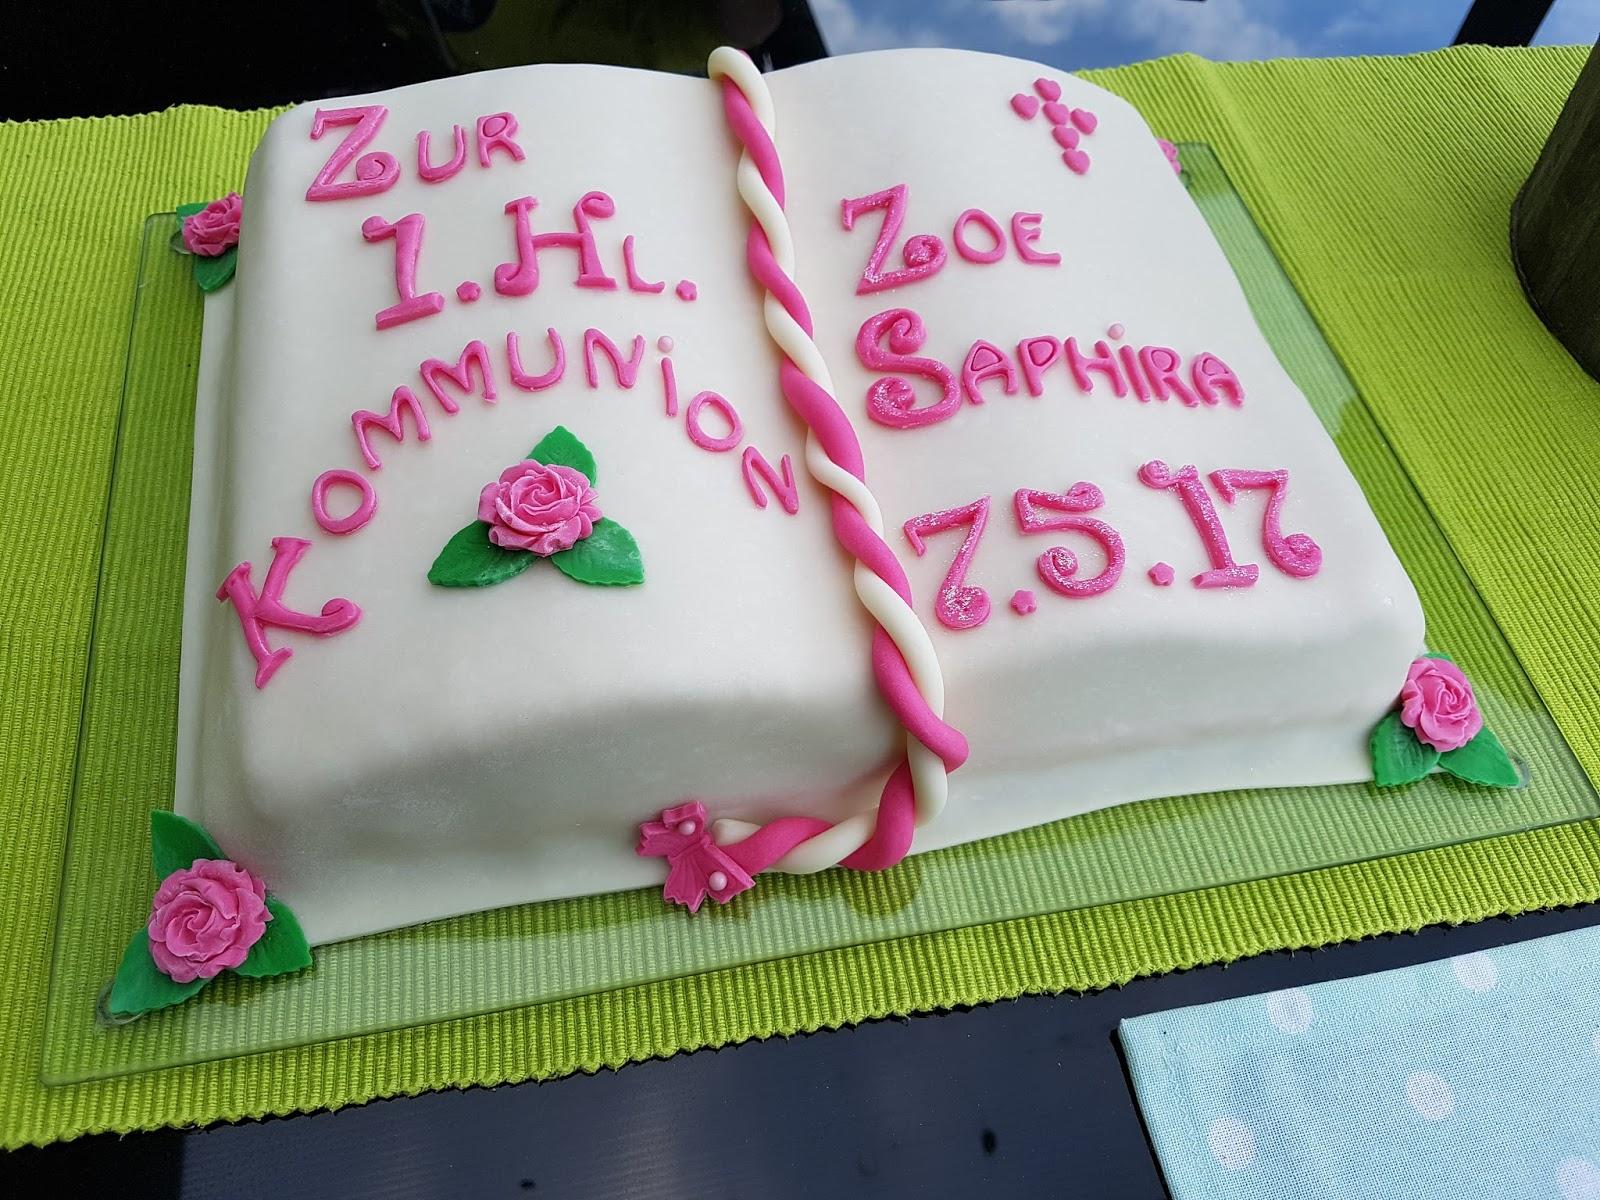 Taufe - Kommunion - Konfirmation - cover